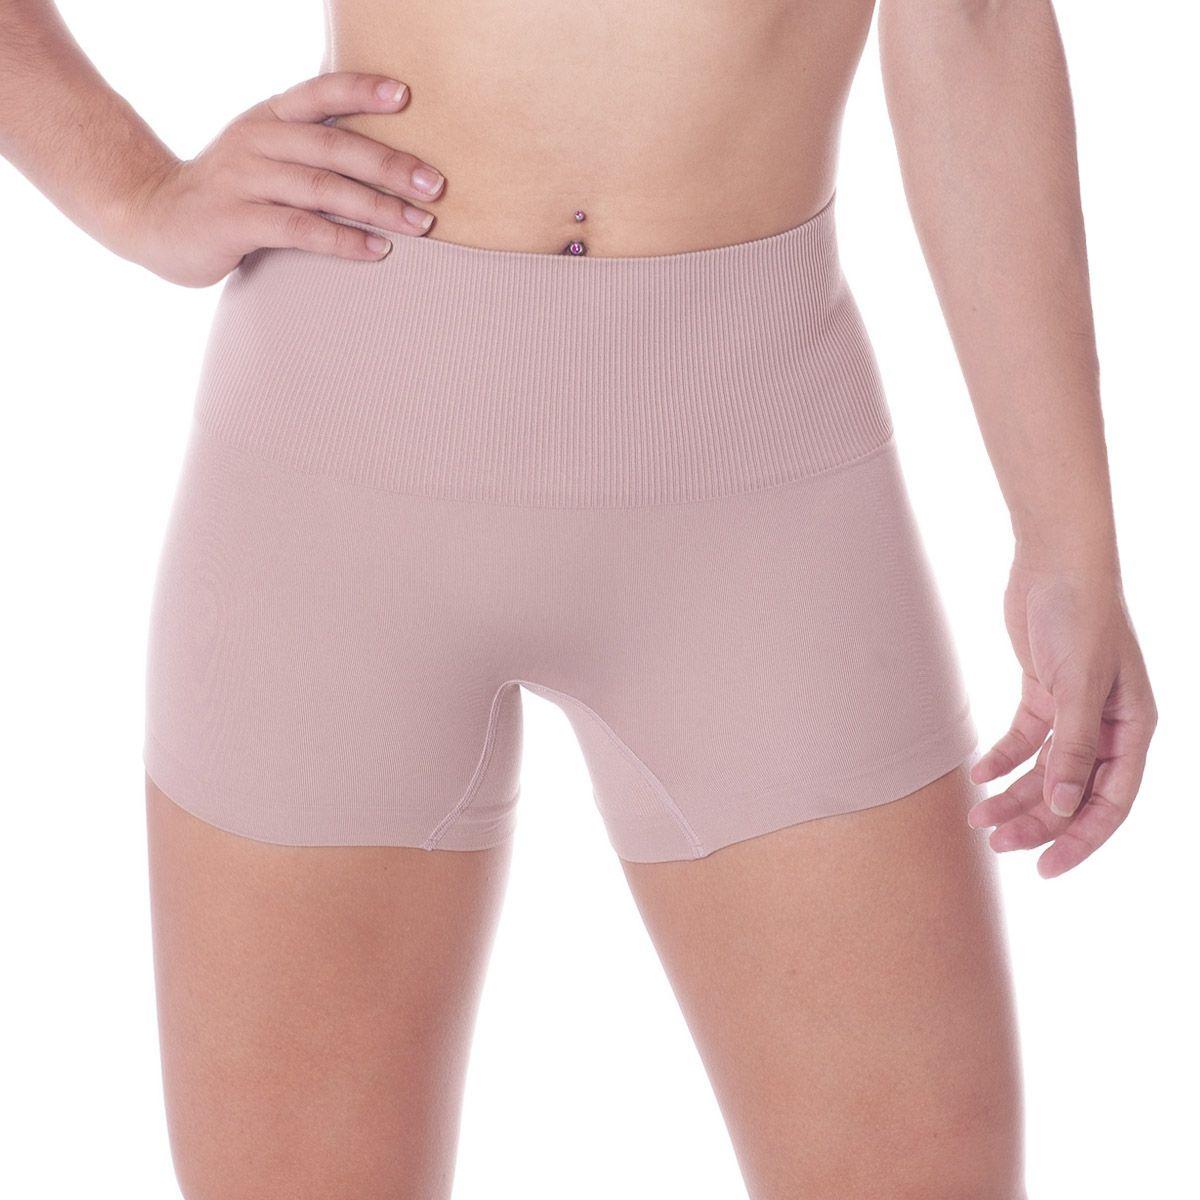 Calcinha Feminina Estilo Boxer Modeladora Trifil